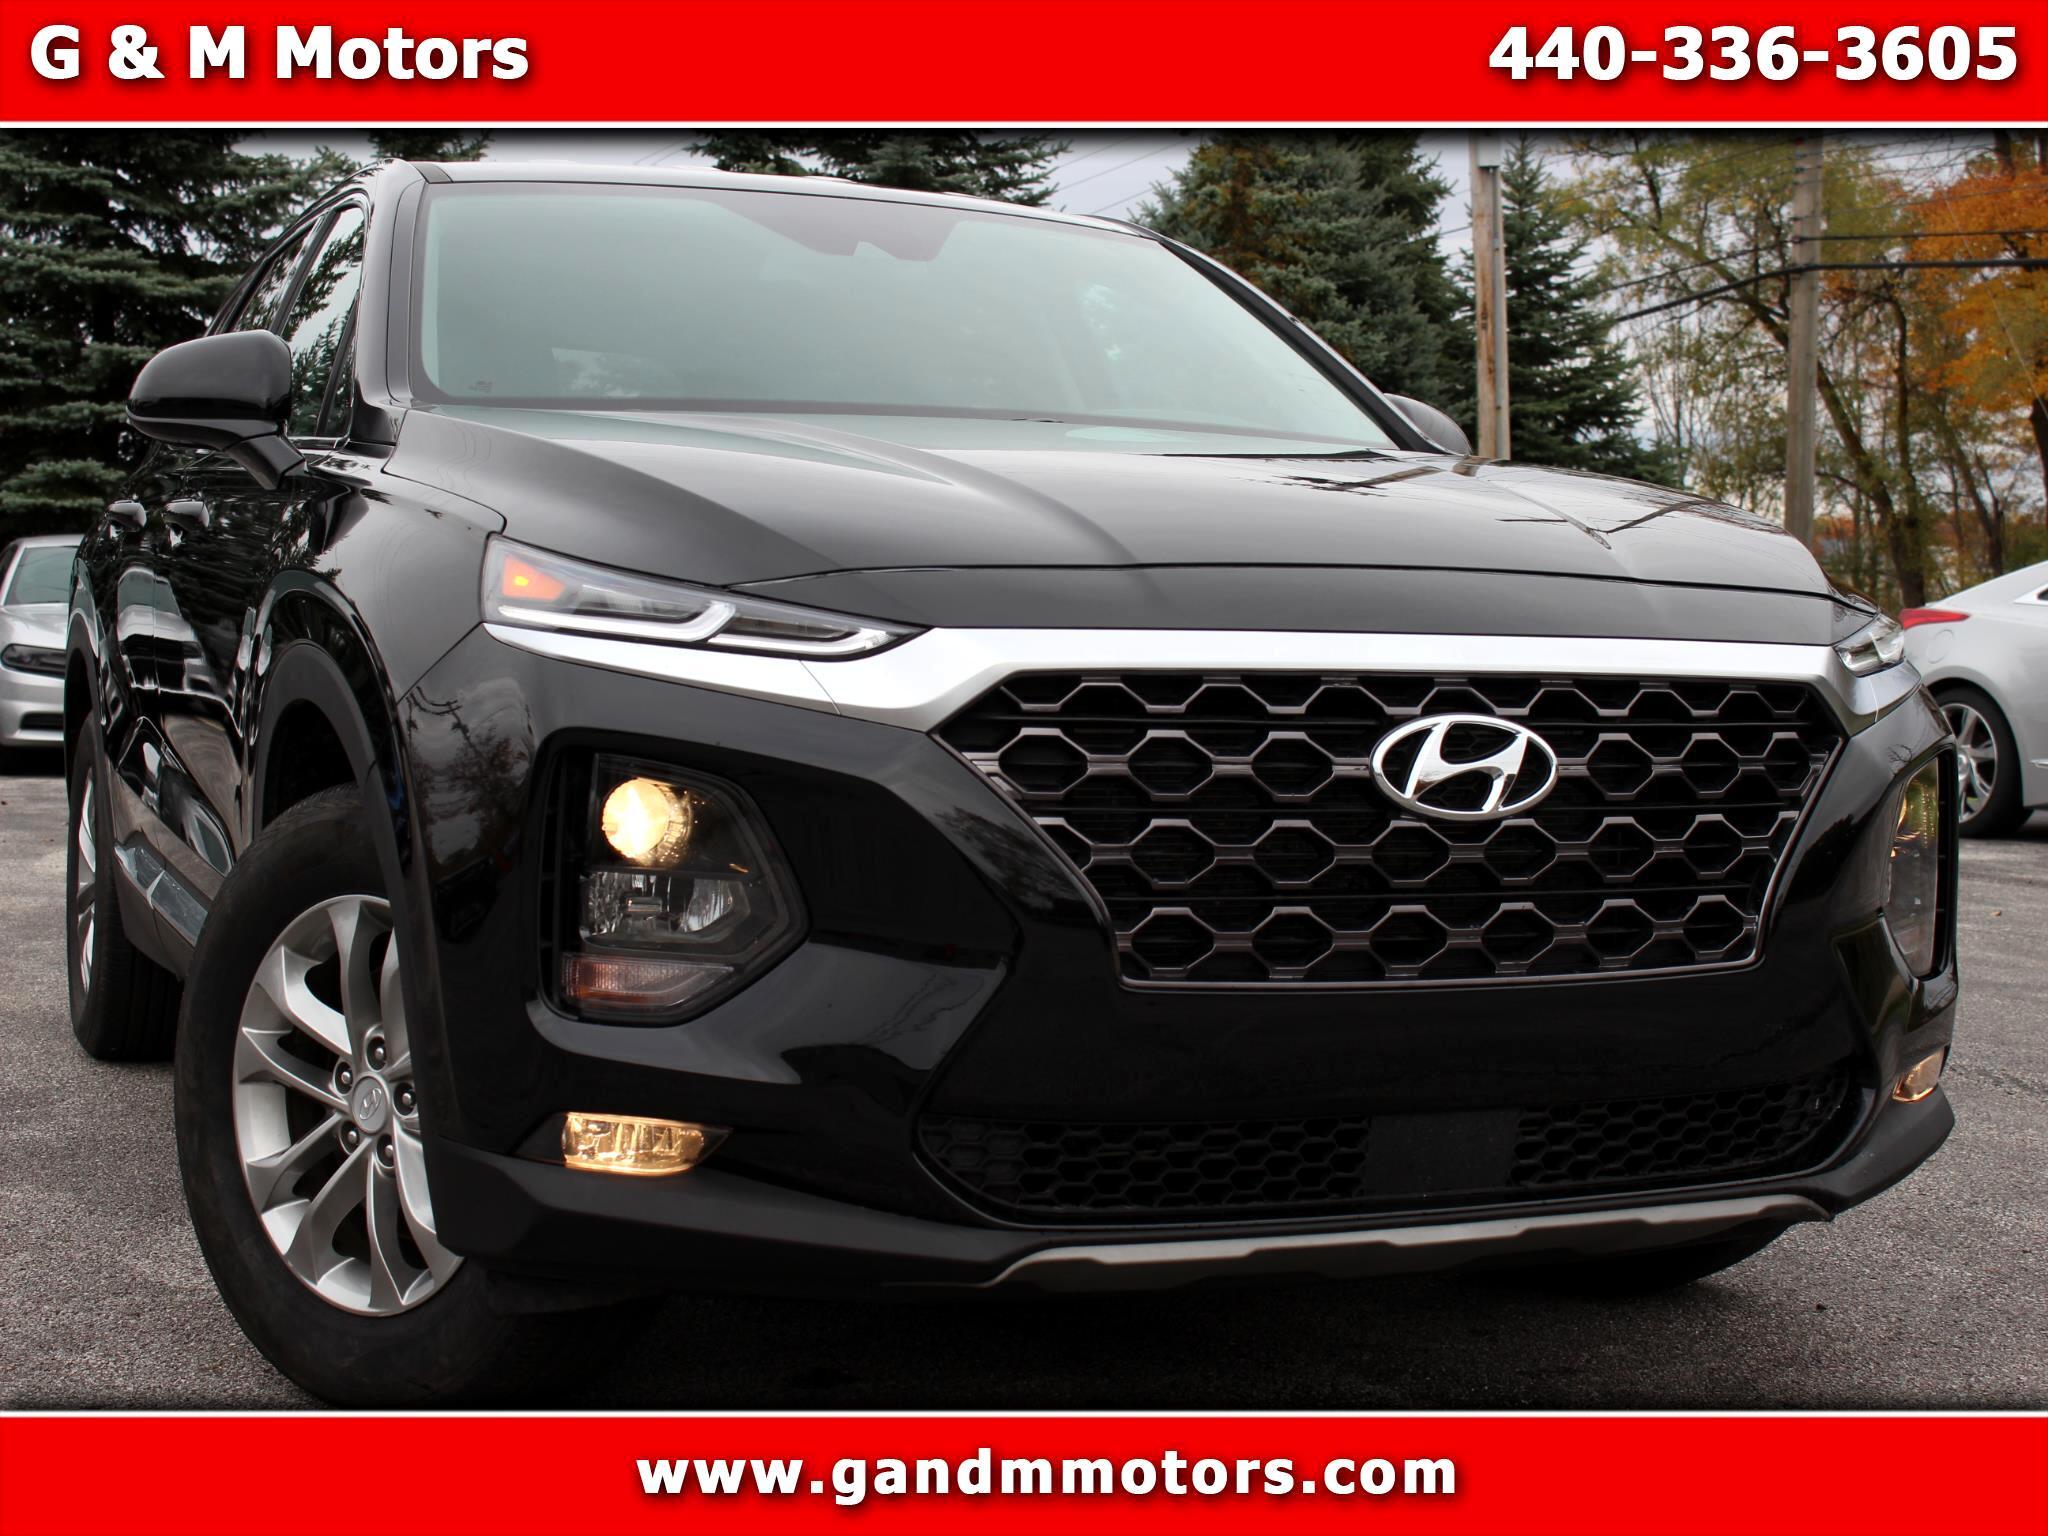 Hyundai Santa Fe SEL 2.4L Auto FWD 2020